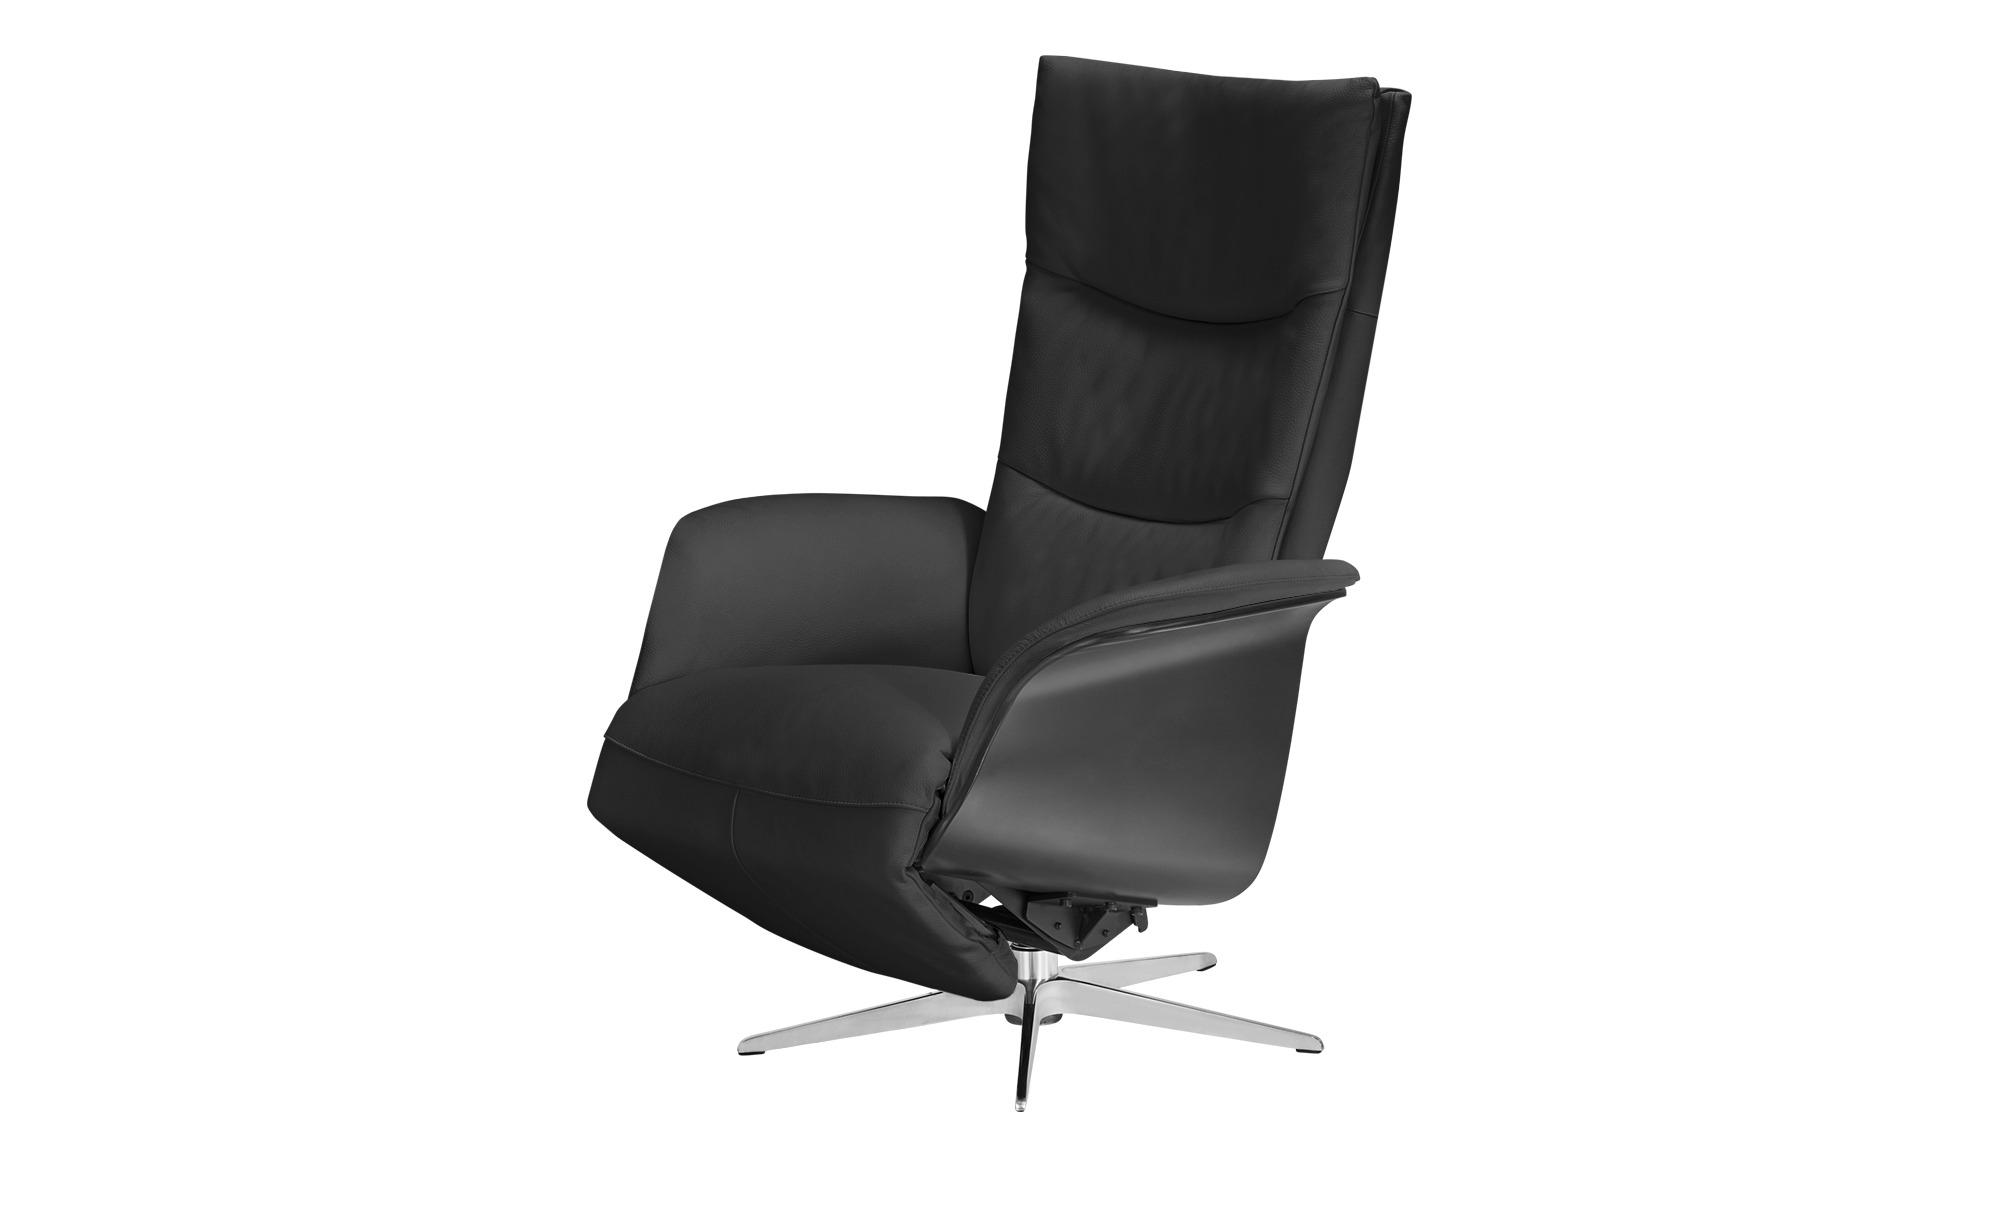 Relaxsessel schwarz - Leder Mika ¦ schwarz ¦ Maße (cm): B: 77 H: 109 T: 82 Polstermöbel > Sessel > Fernsehsessel - Höffner